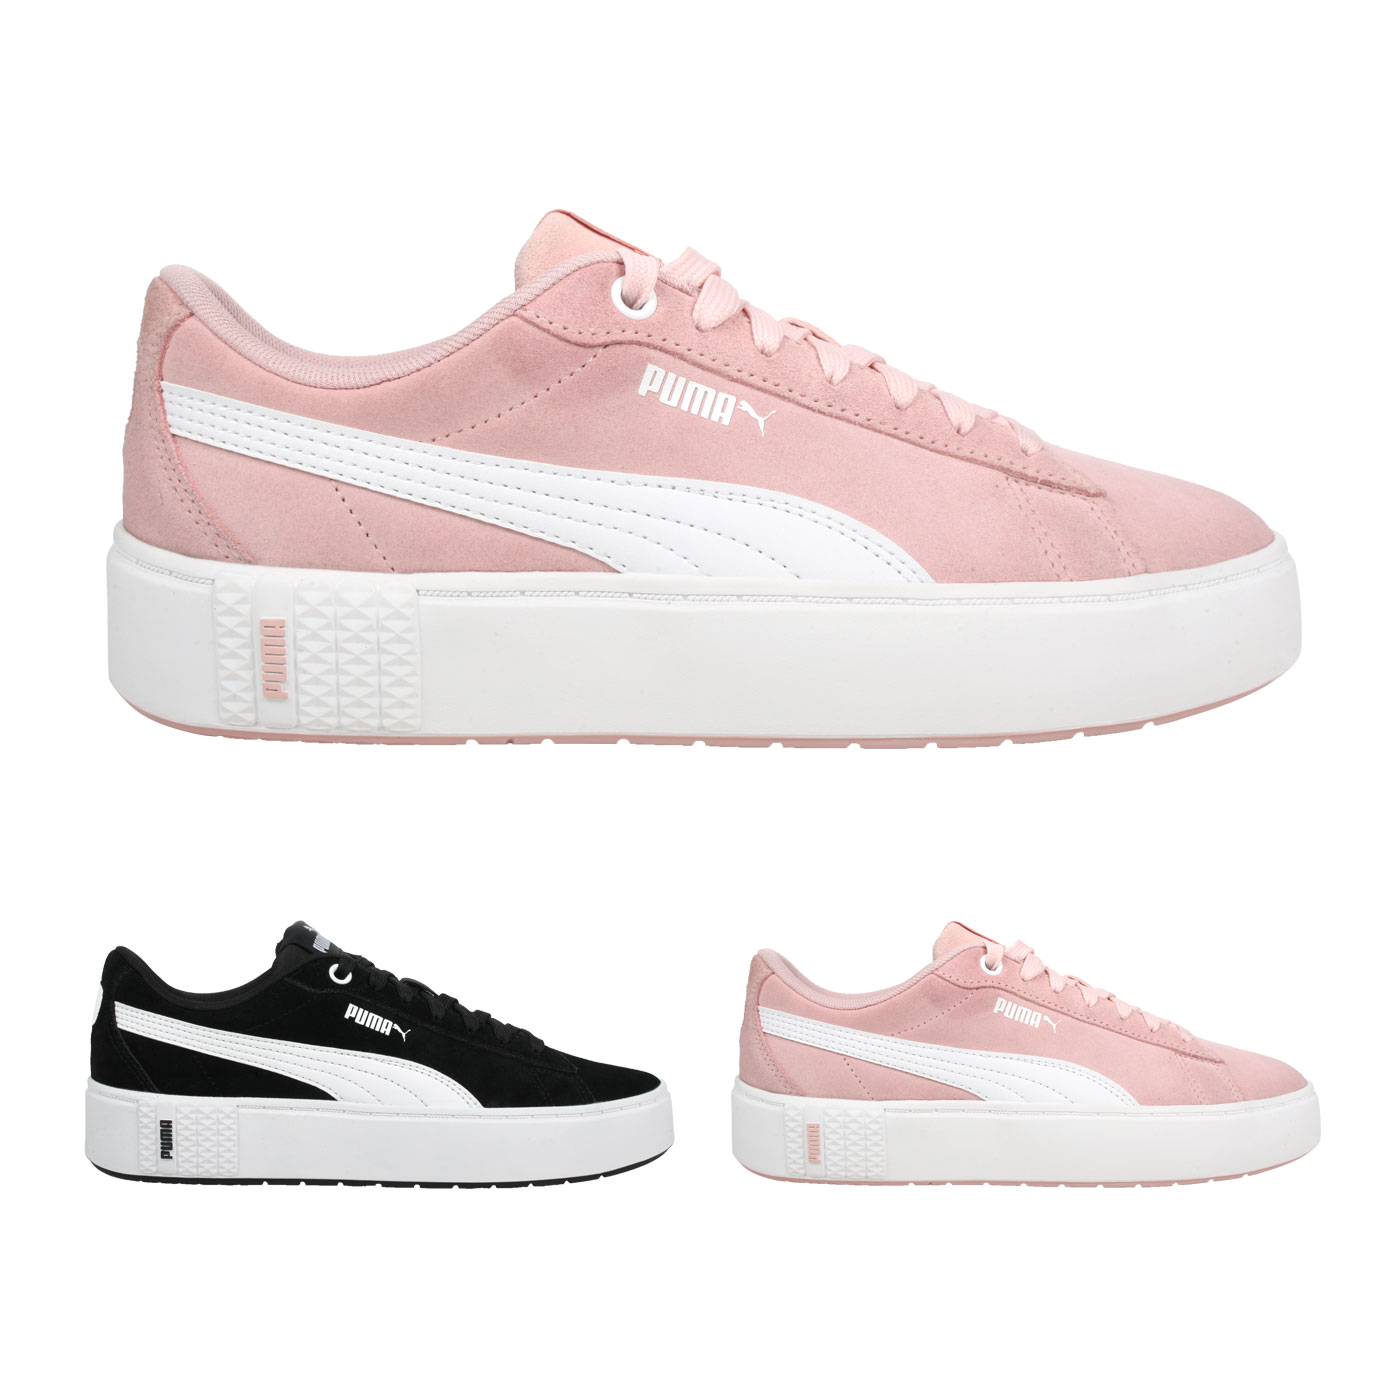 PUMA 女款休閒運動鞋  @Smash Platform v2 SD@37303704